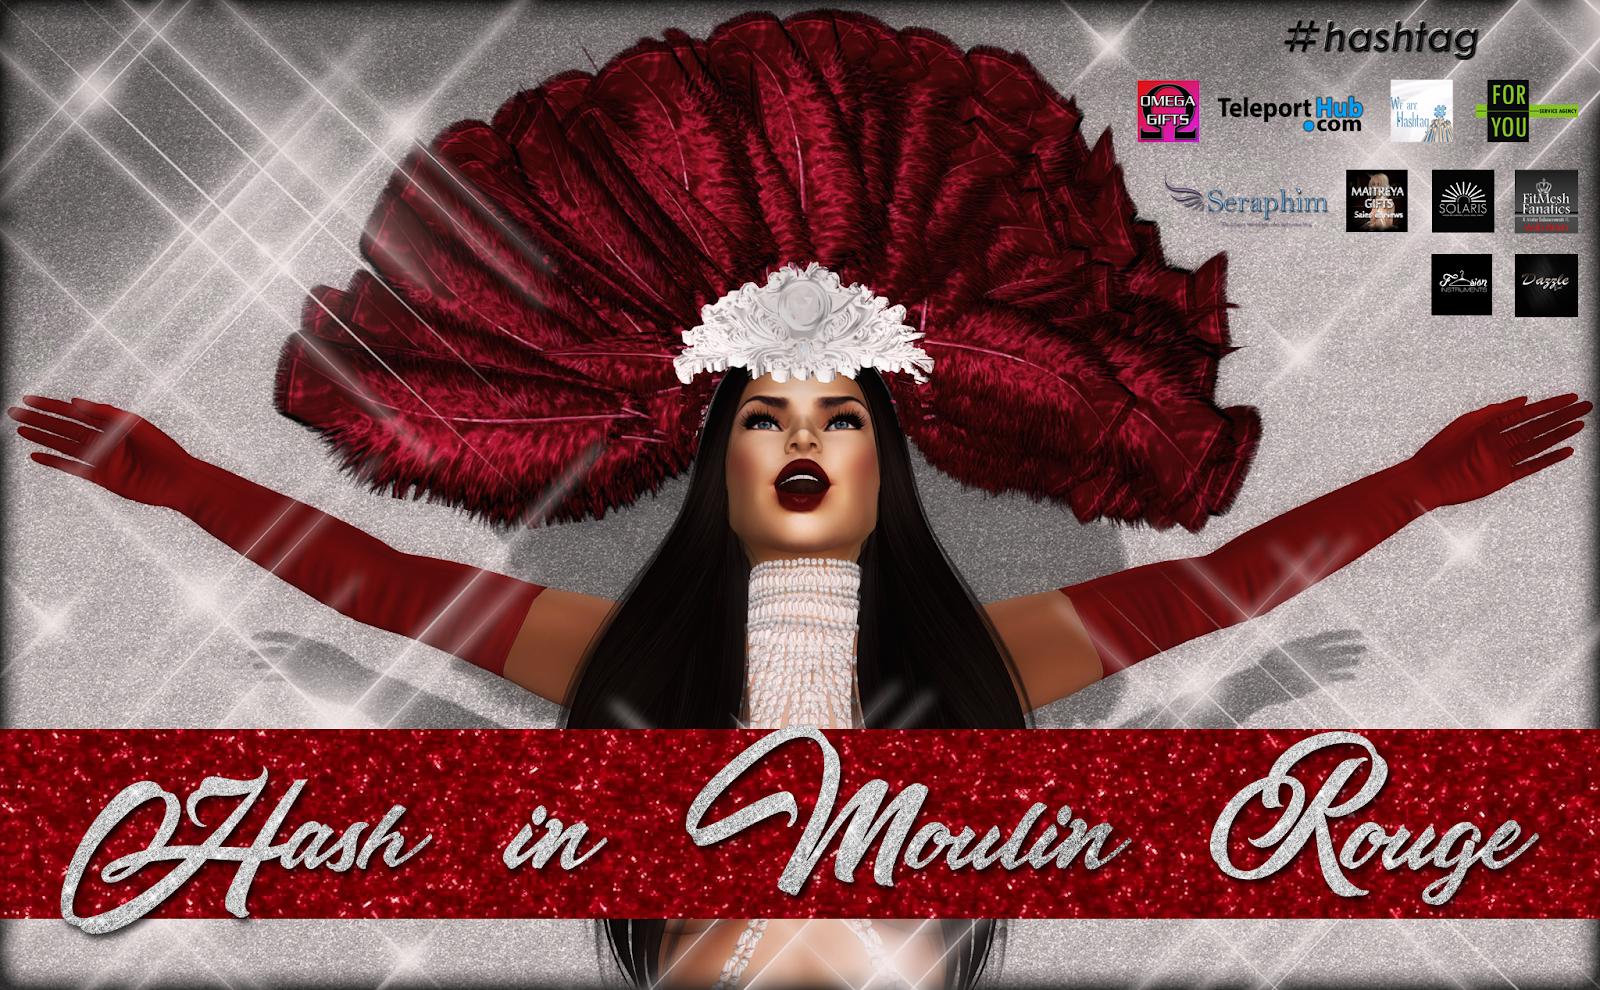 Hash in Moulin Rouge - June